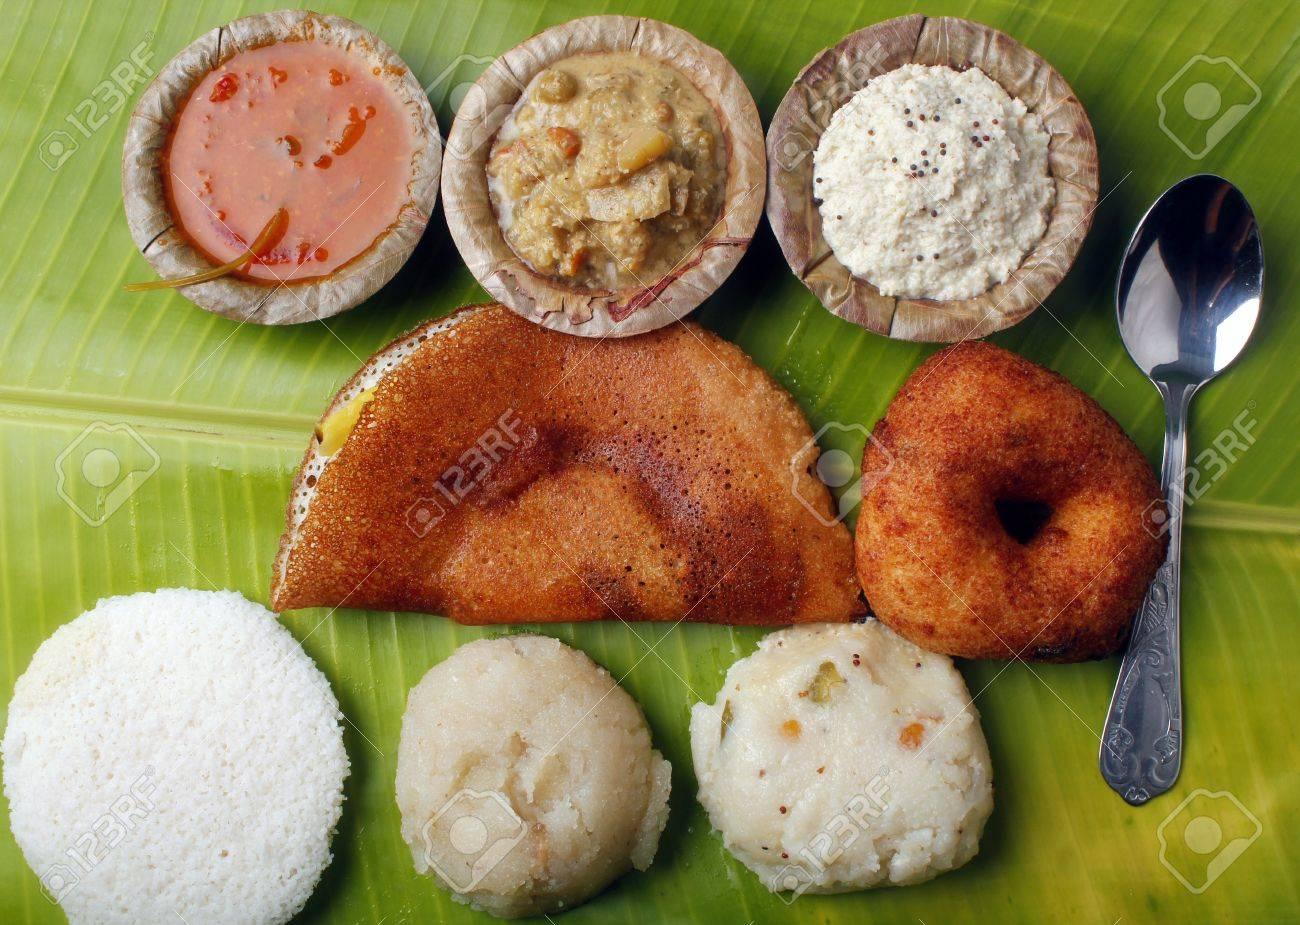 Masala dosa, idly, vada, chutney, upma, curry and sambar on a banana leaf Stock Photo - 10227229